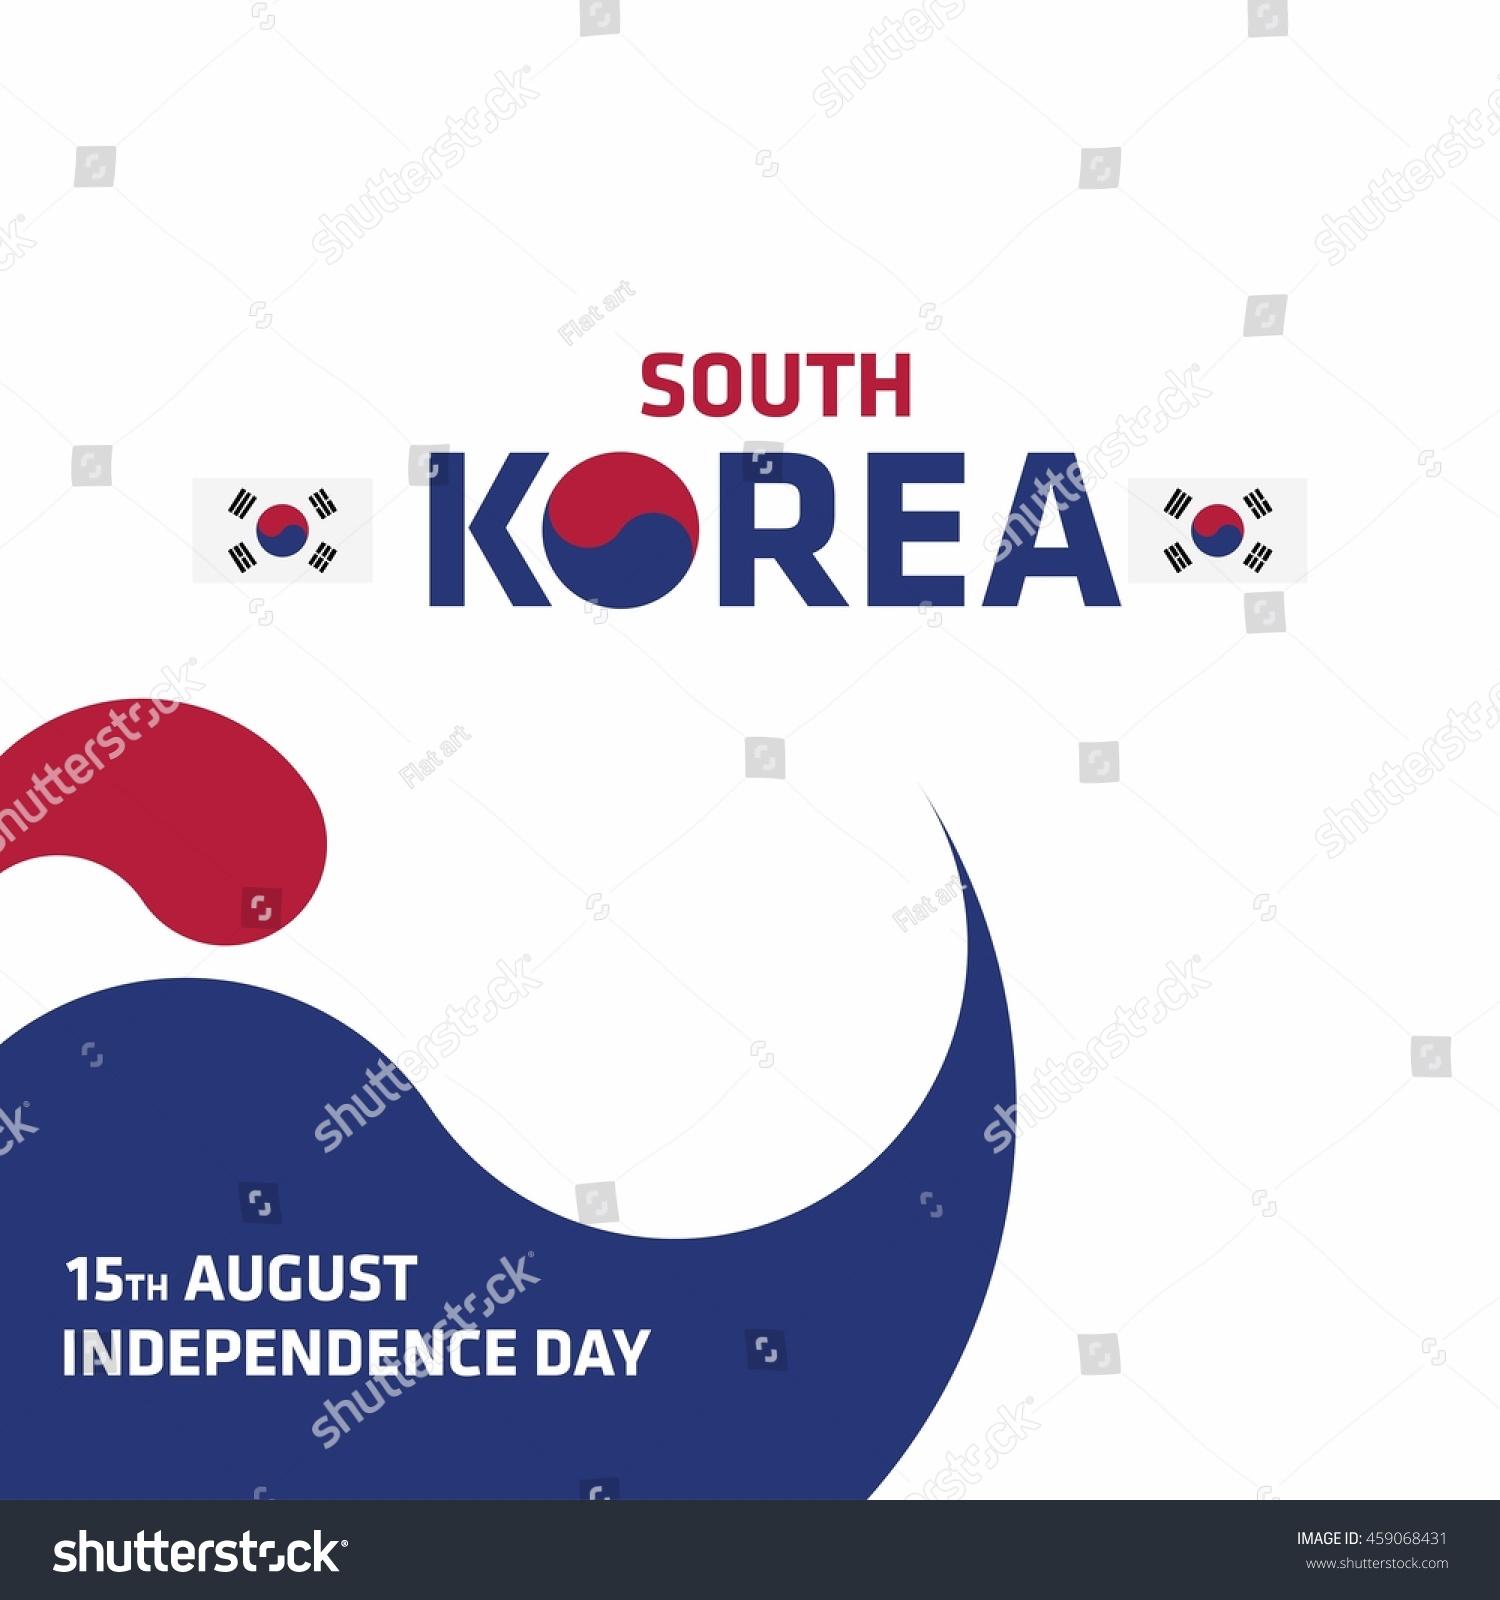 Korean poster design - National Liberation Day Of Korea Korean Gwangbokjeol Abstract Background South Korea Independence Day